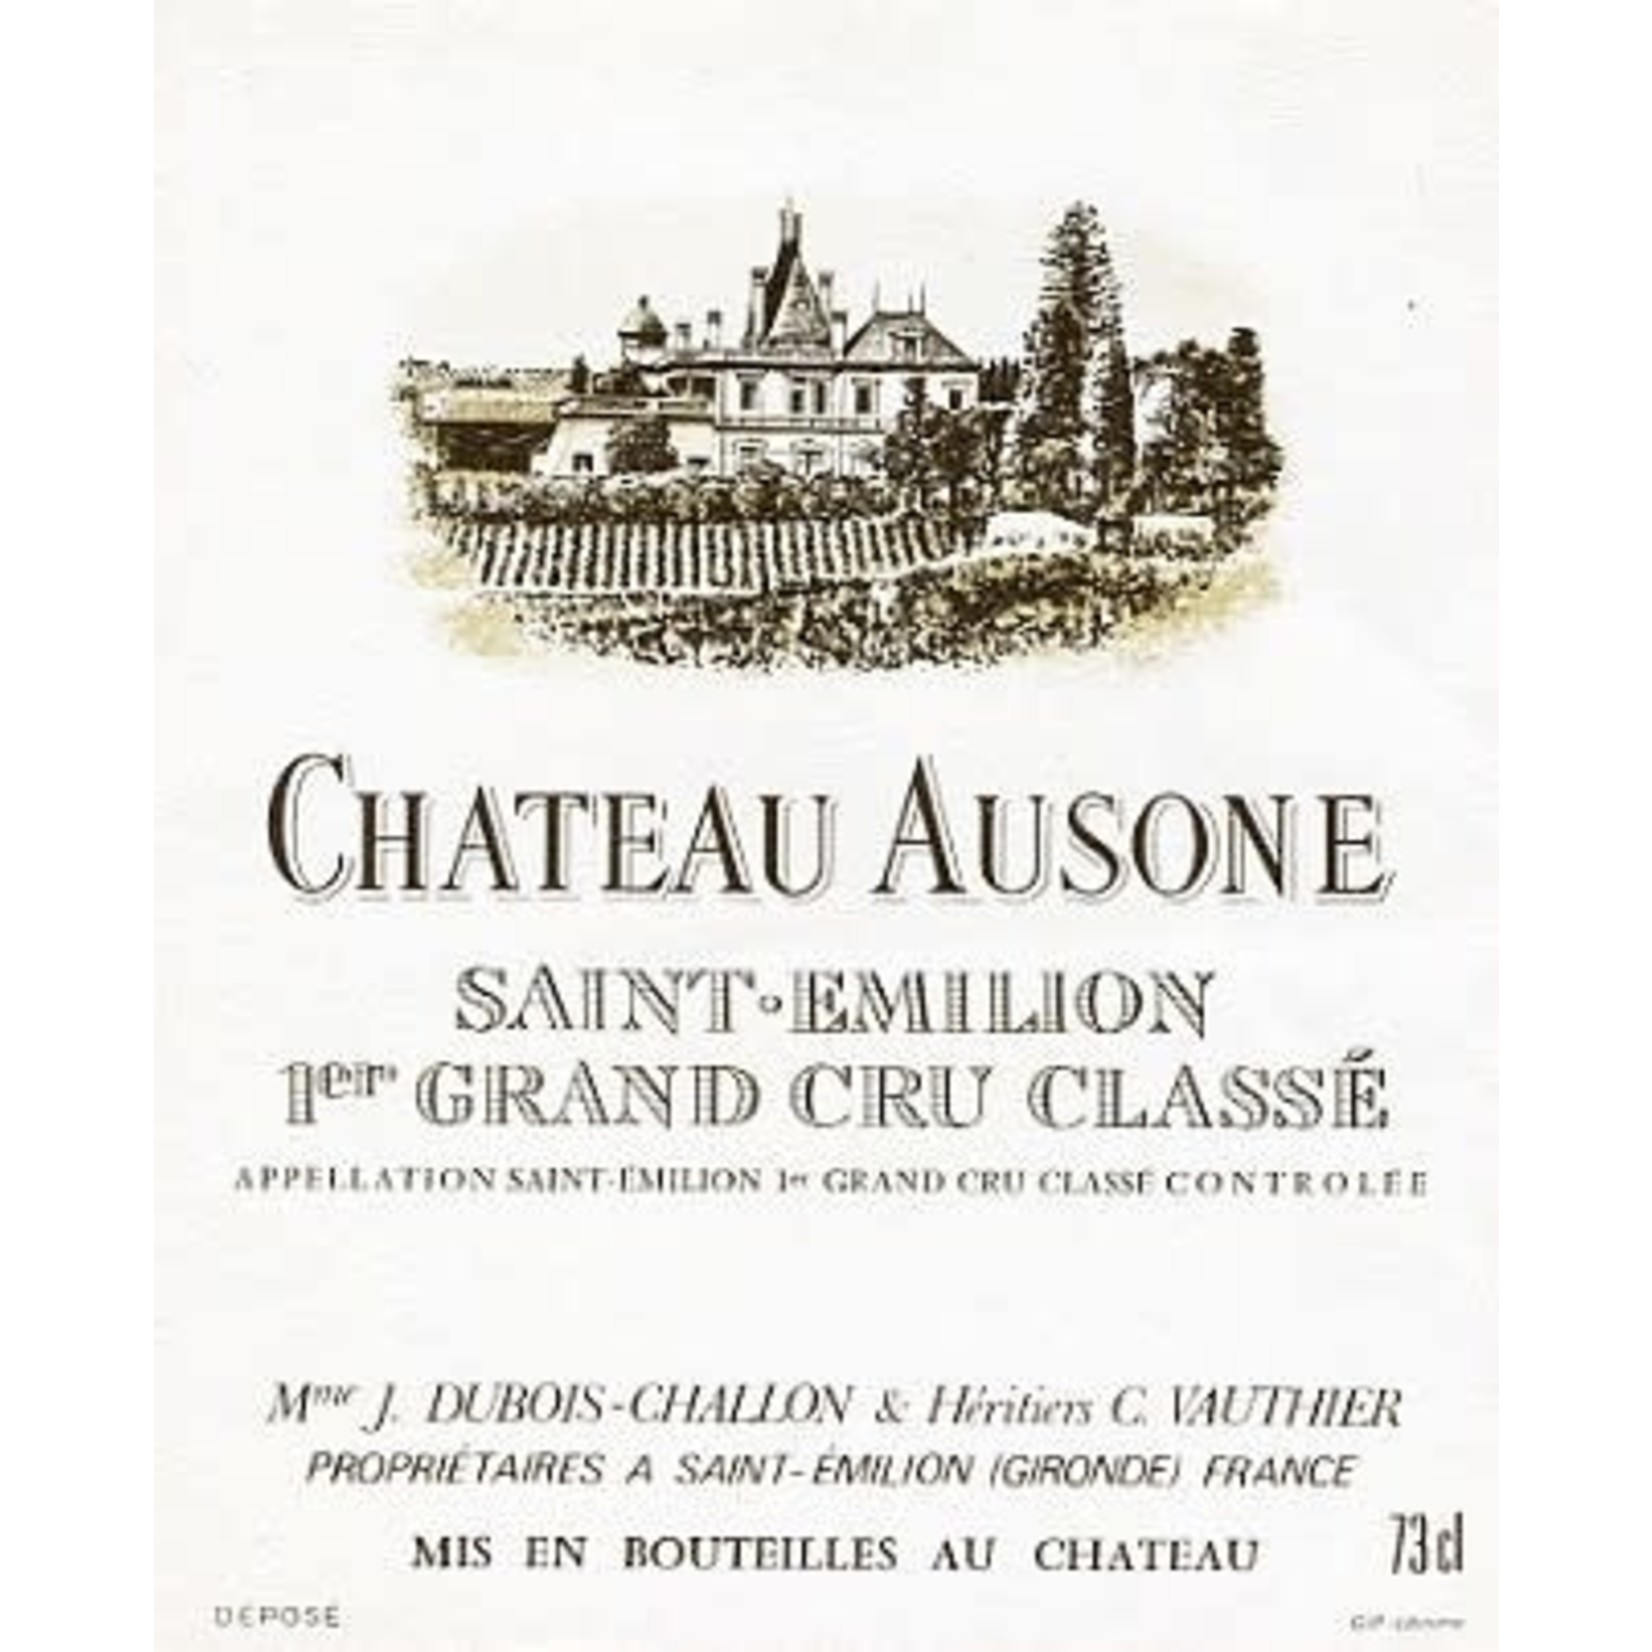 Wine Chateau Ausone Saint Emilion 1986